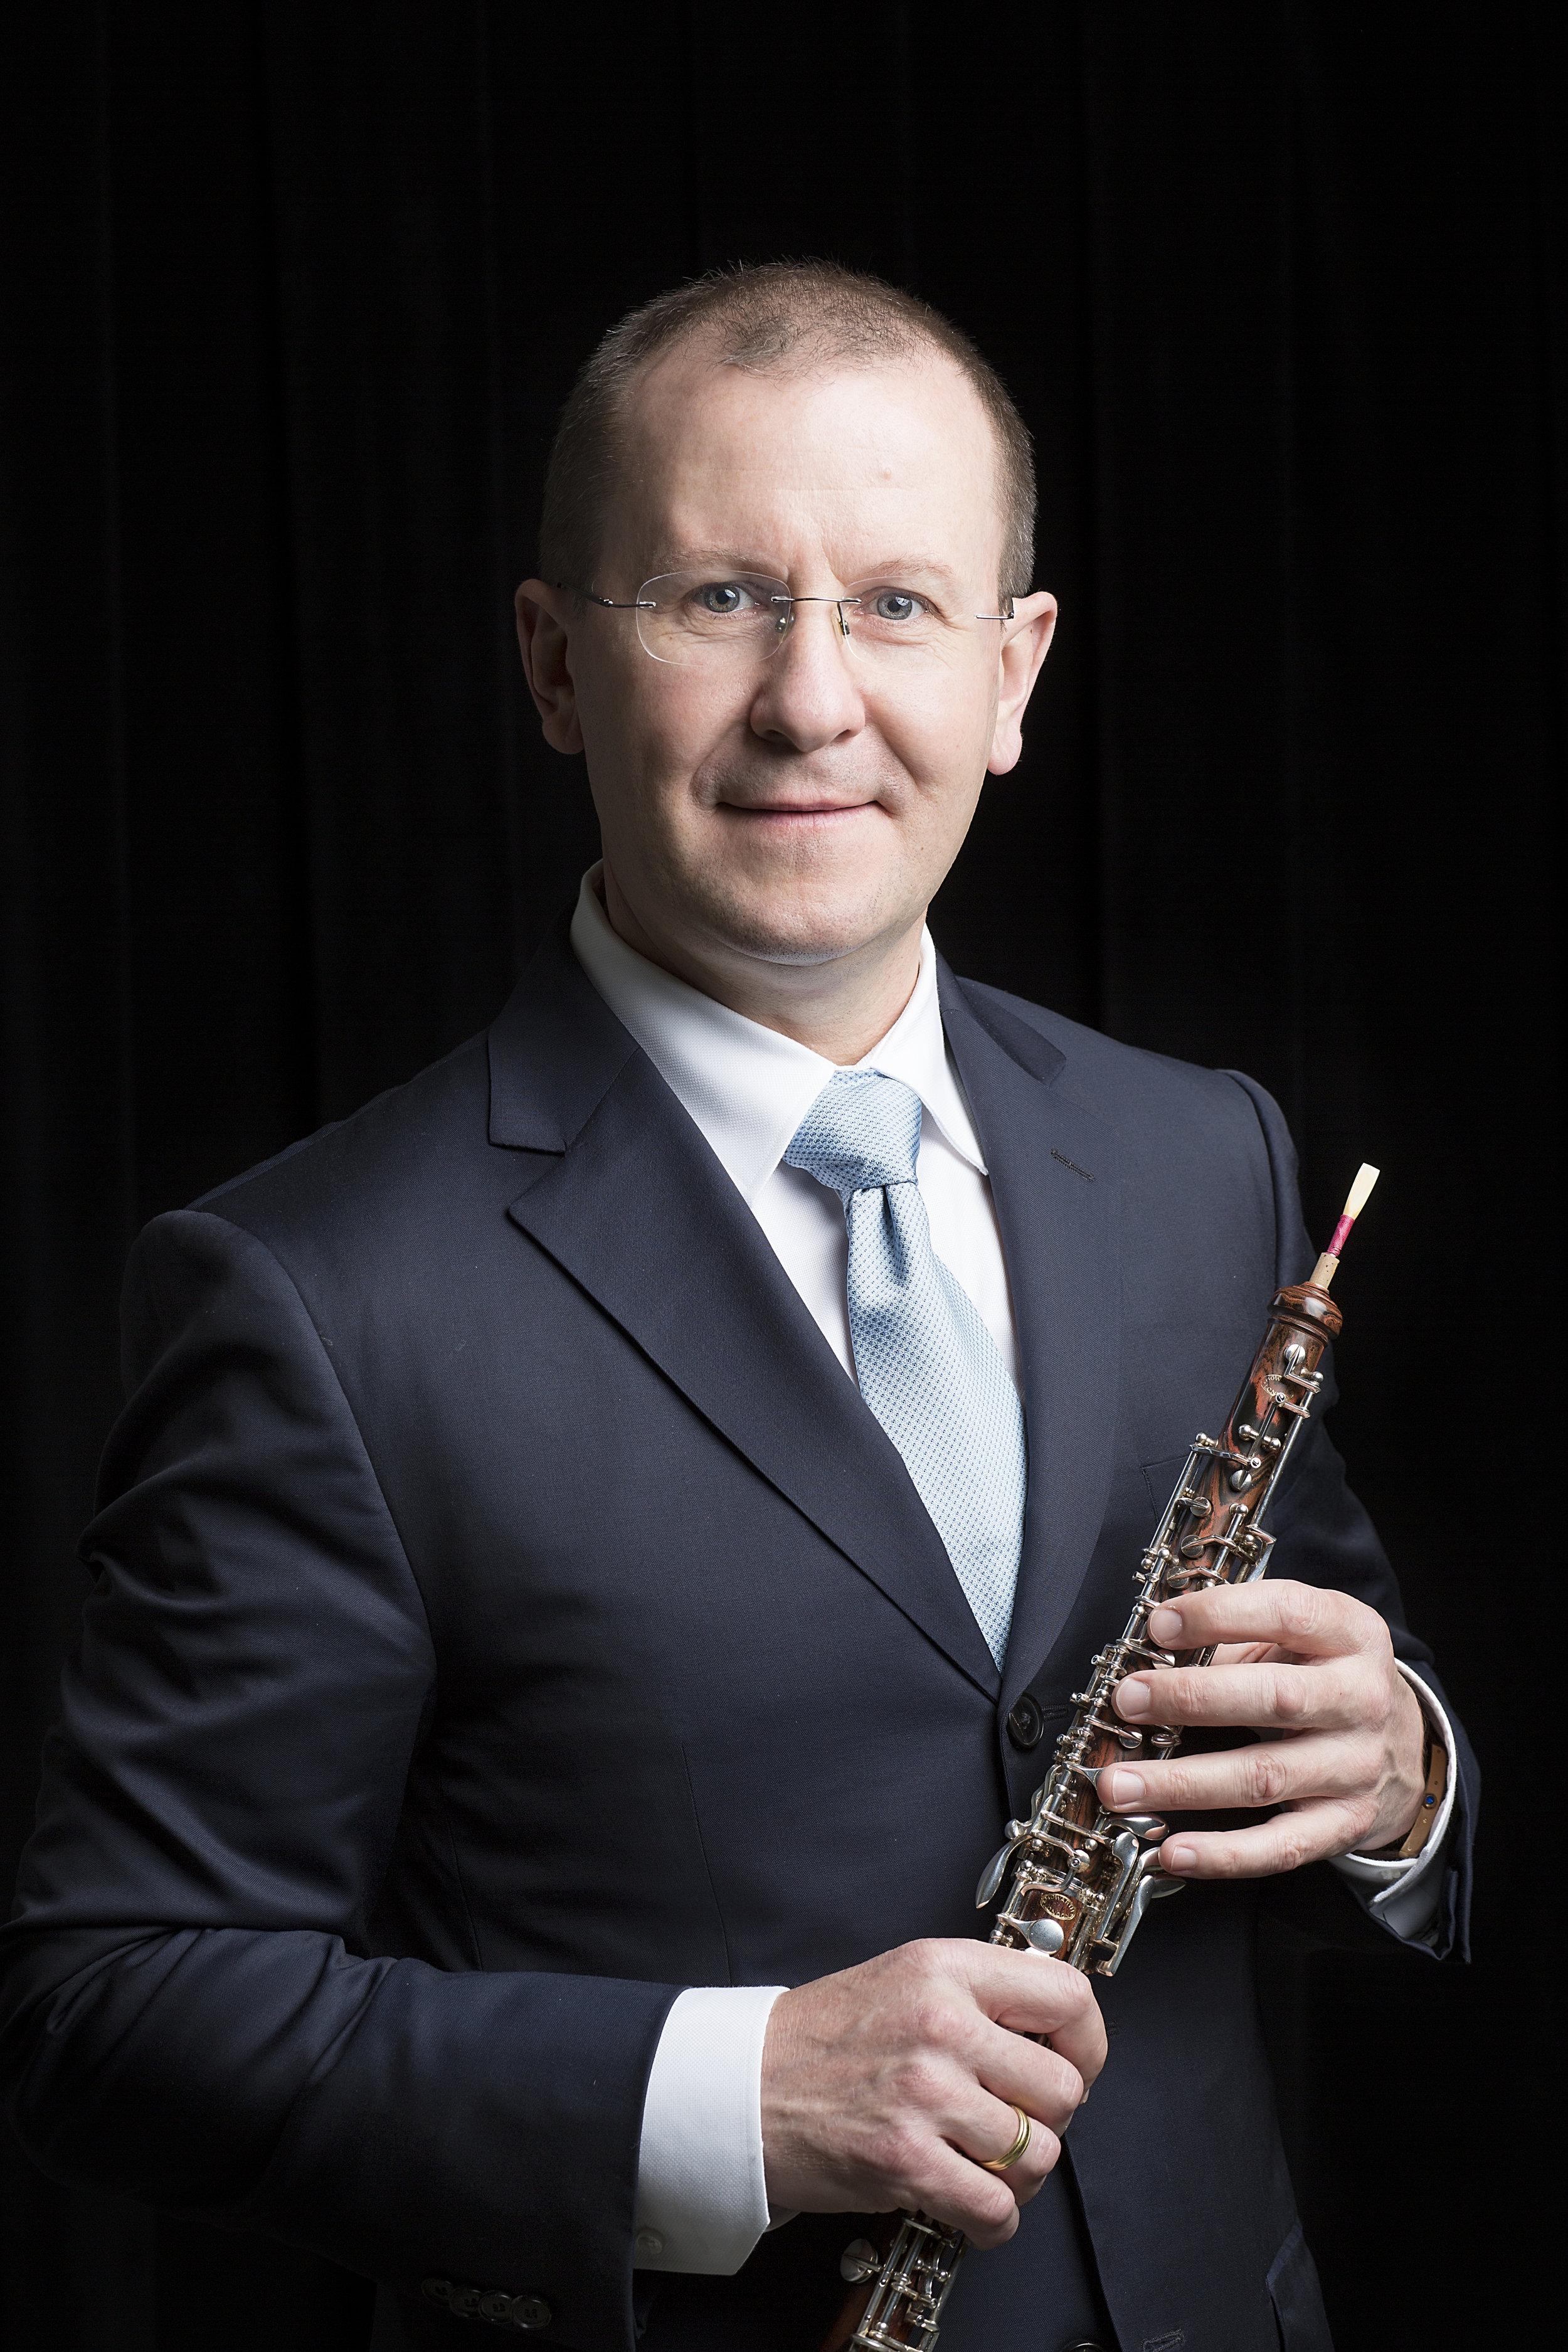 Igor Leschishin - Principal Oboe